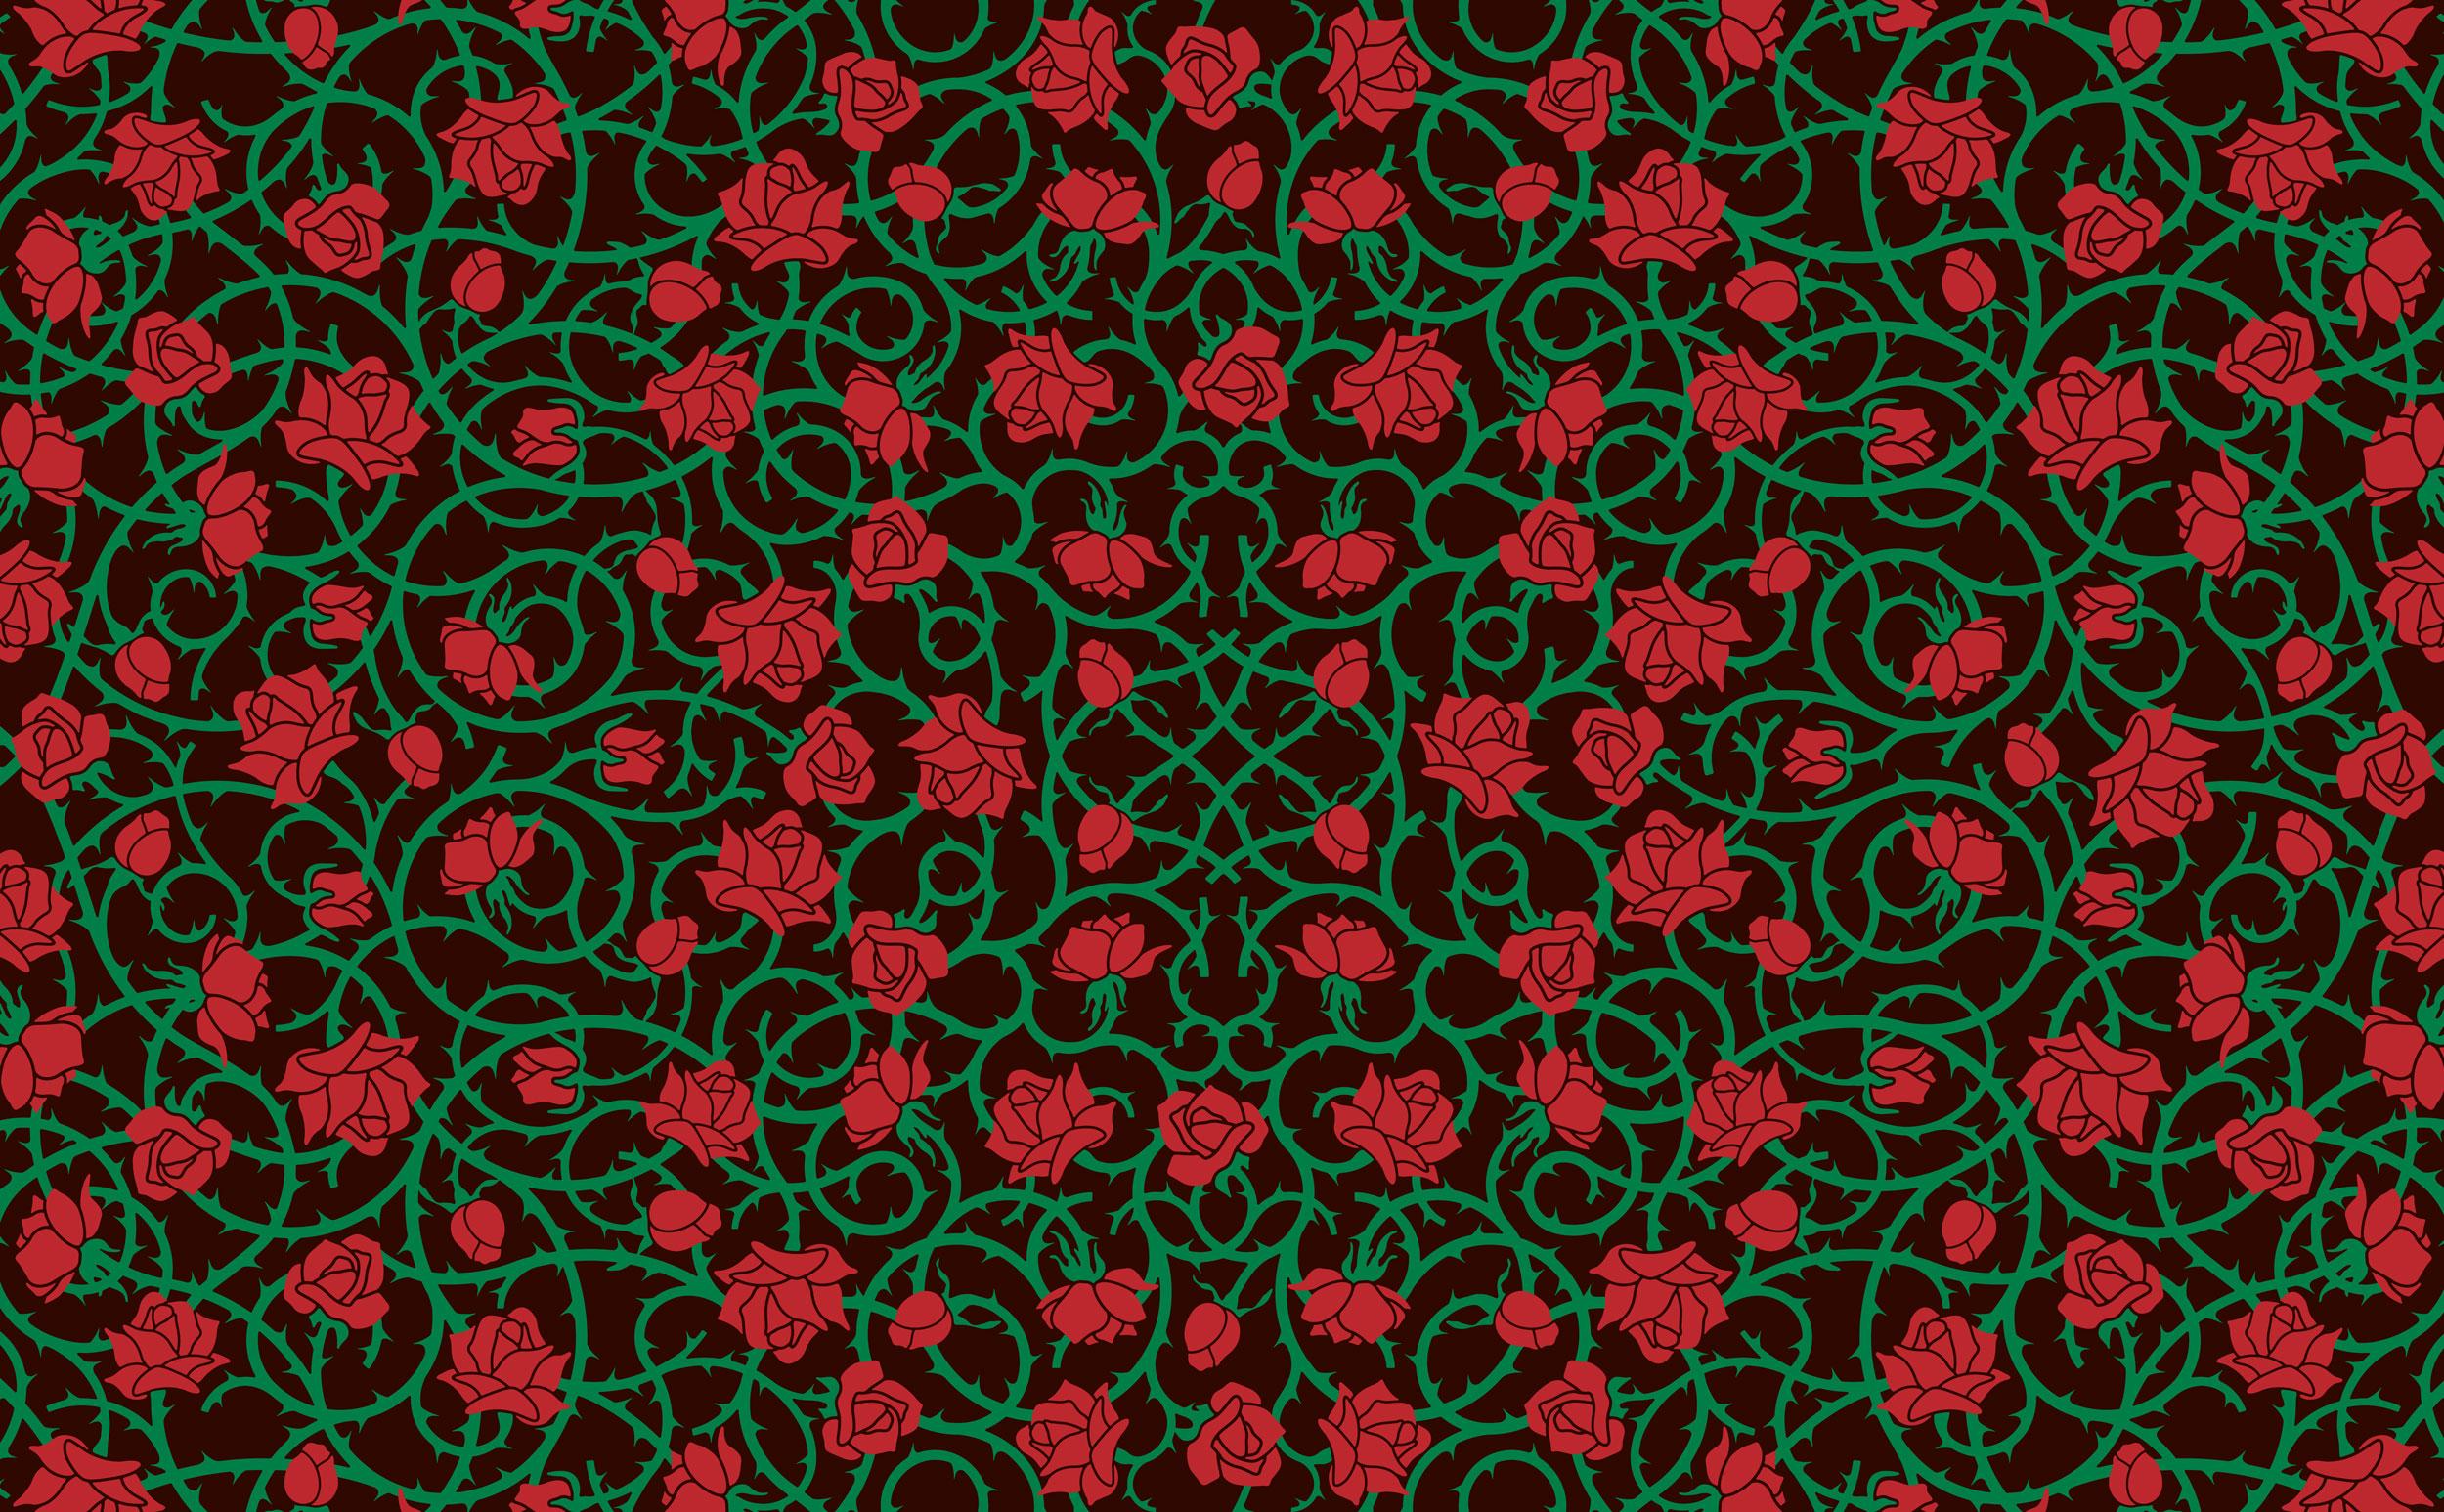 rozen-pers